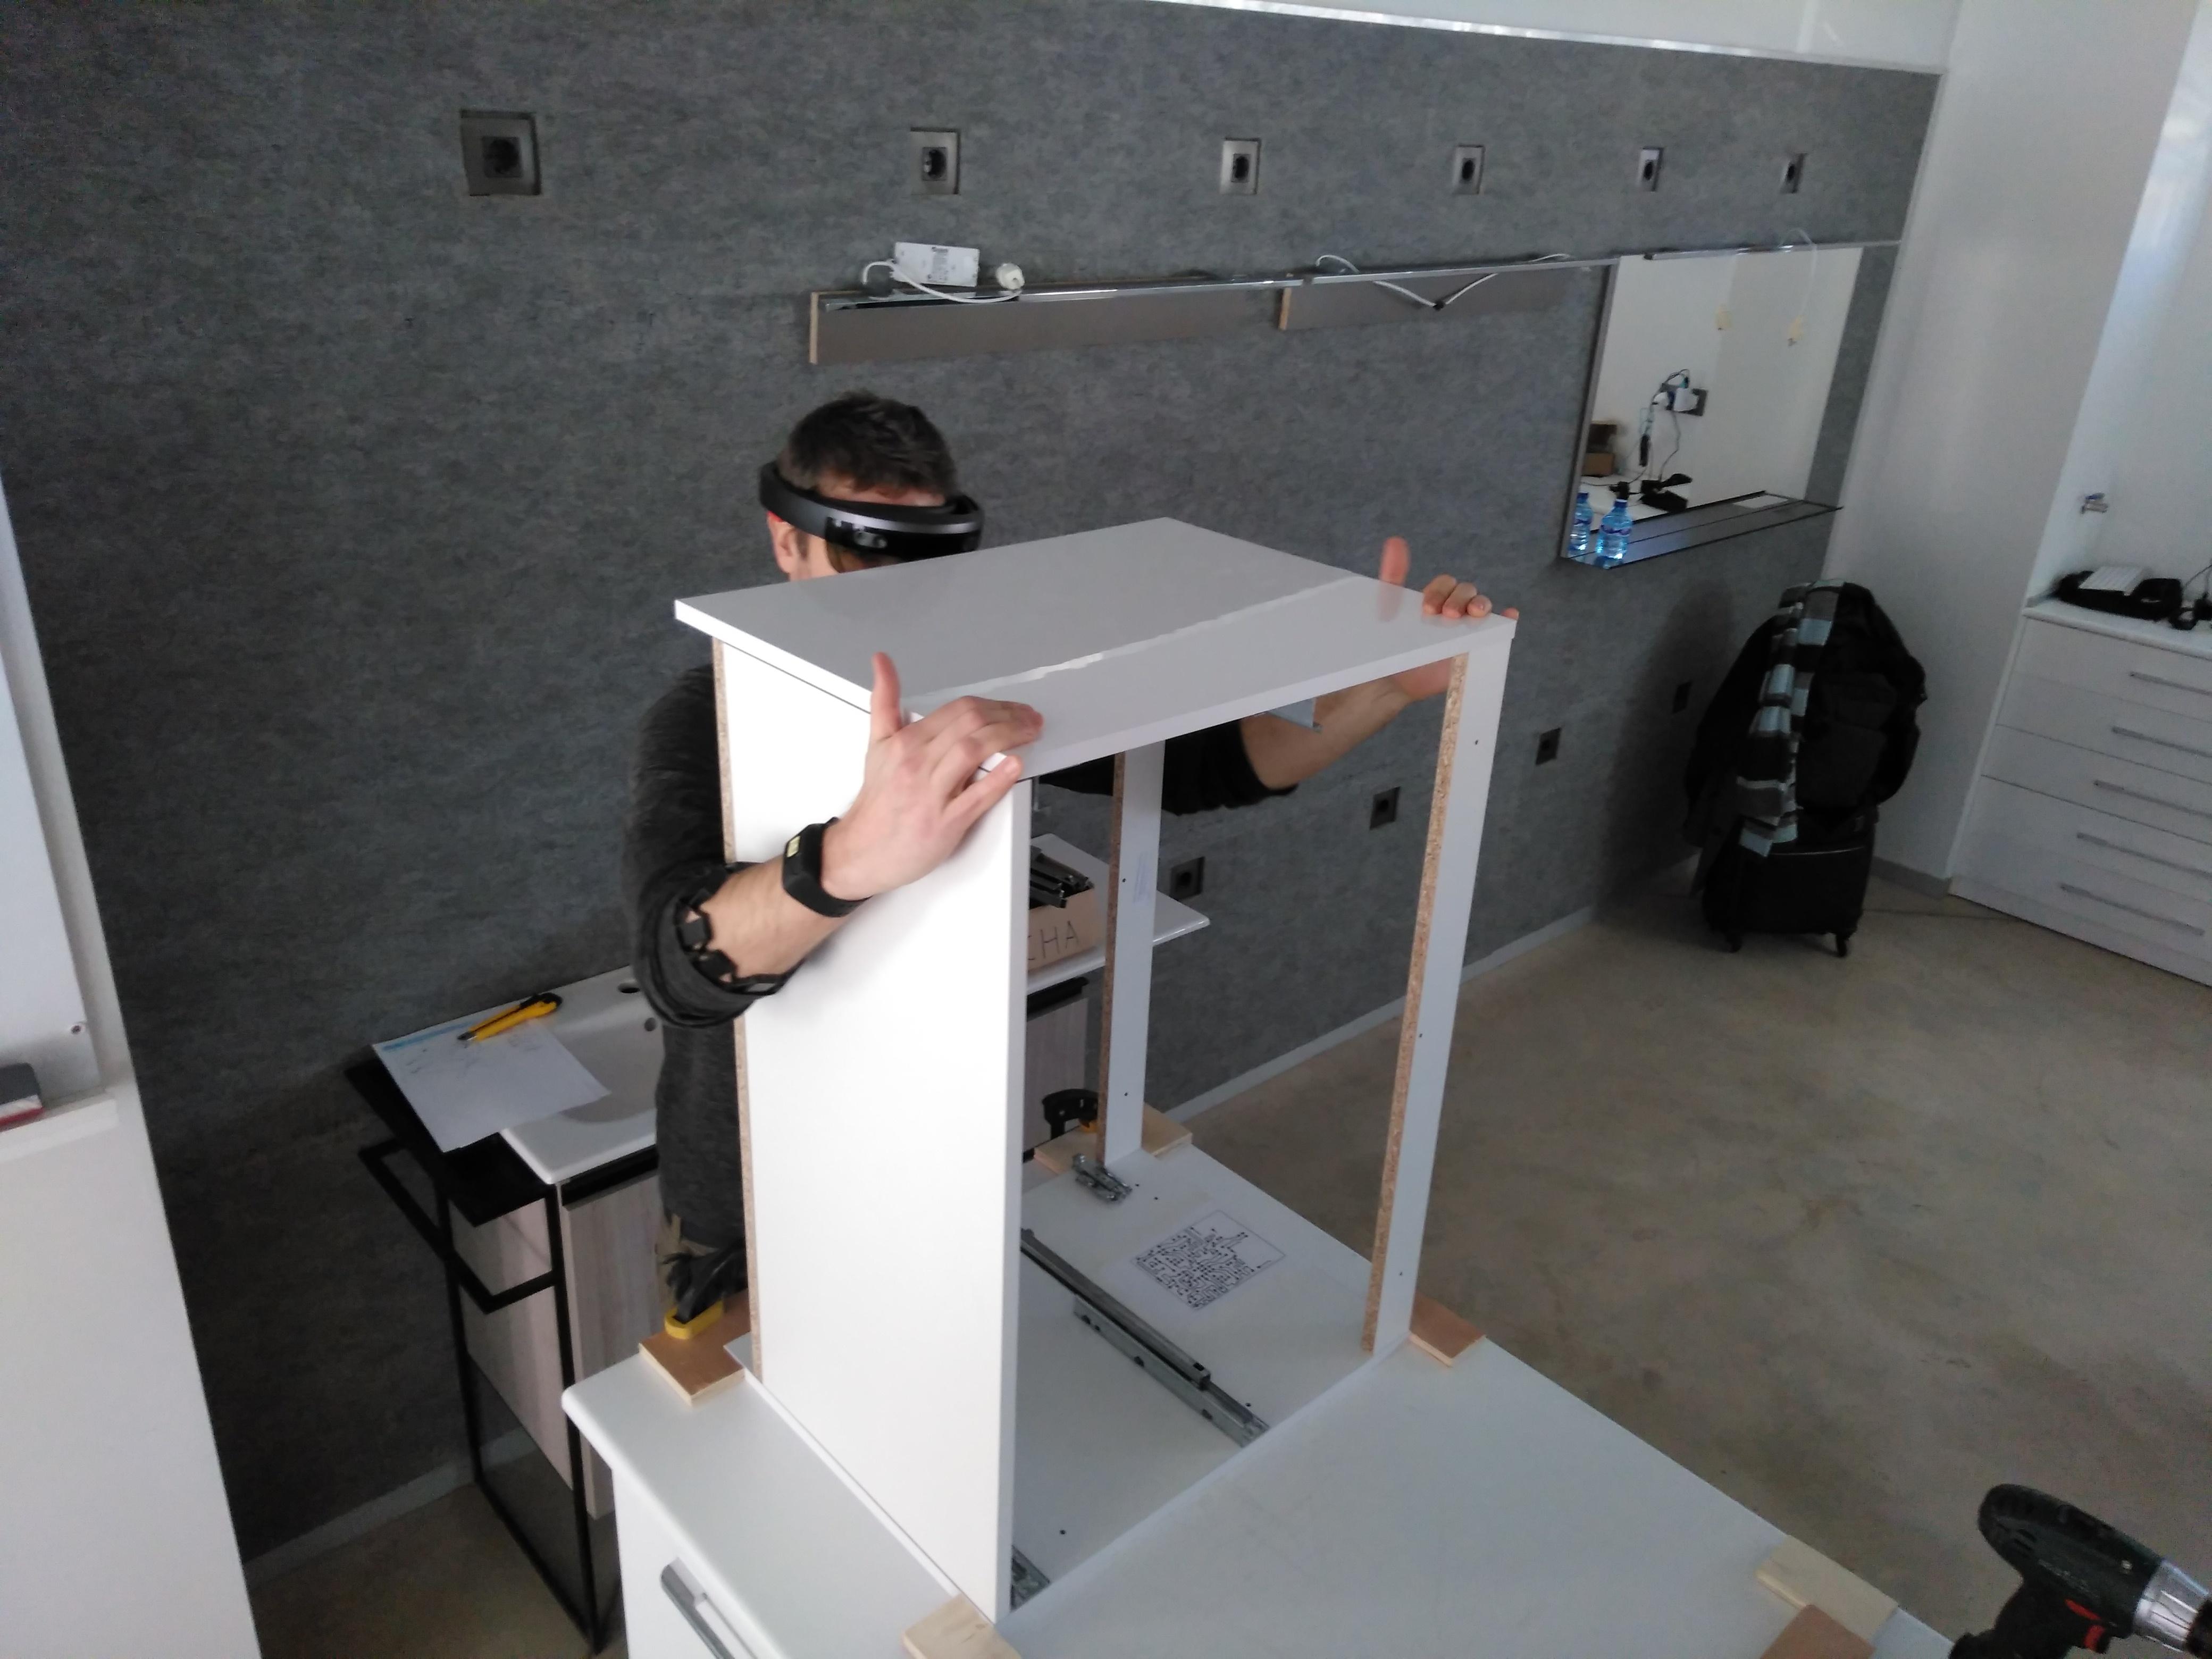 KIT Testing being tested in Royo